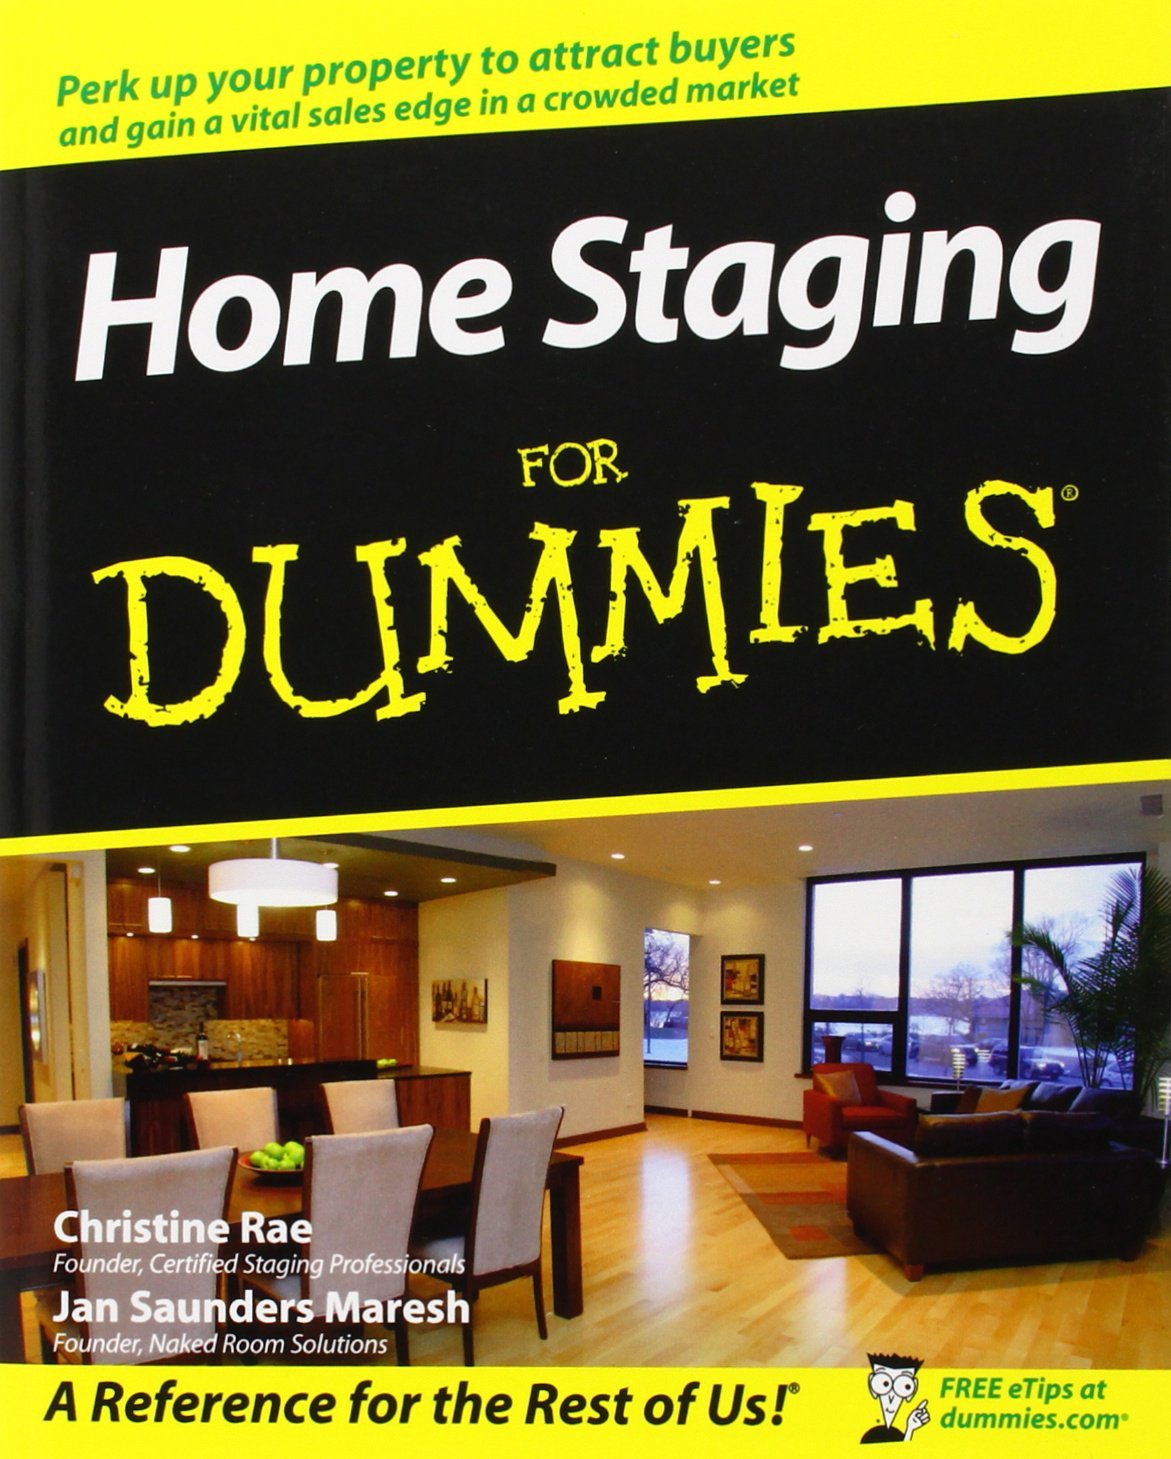 Home Staging For Dummies  Rae, Christine, Saunders Maresh, Jan ...